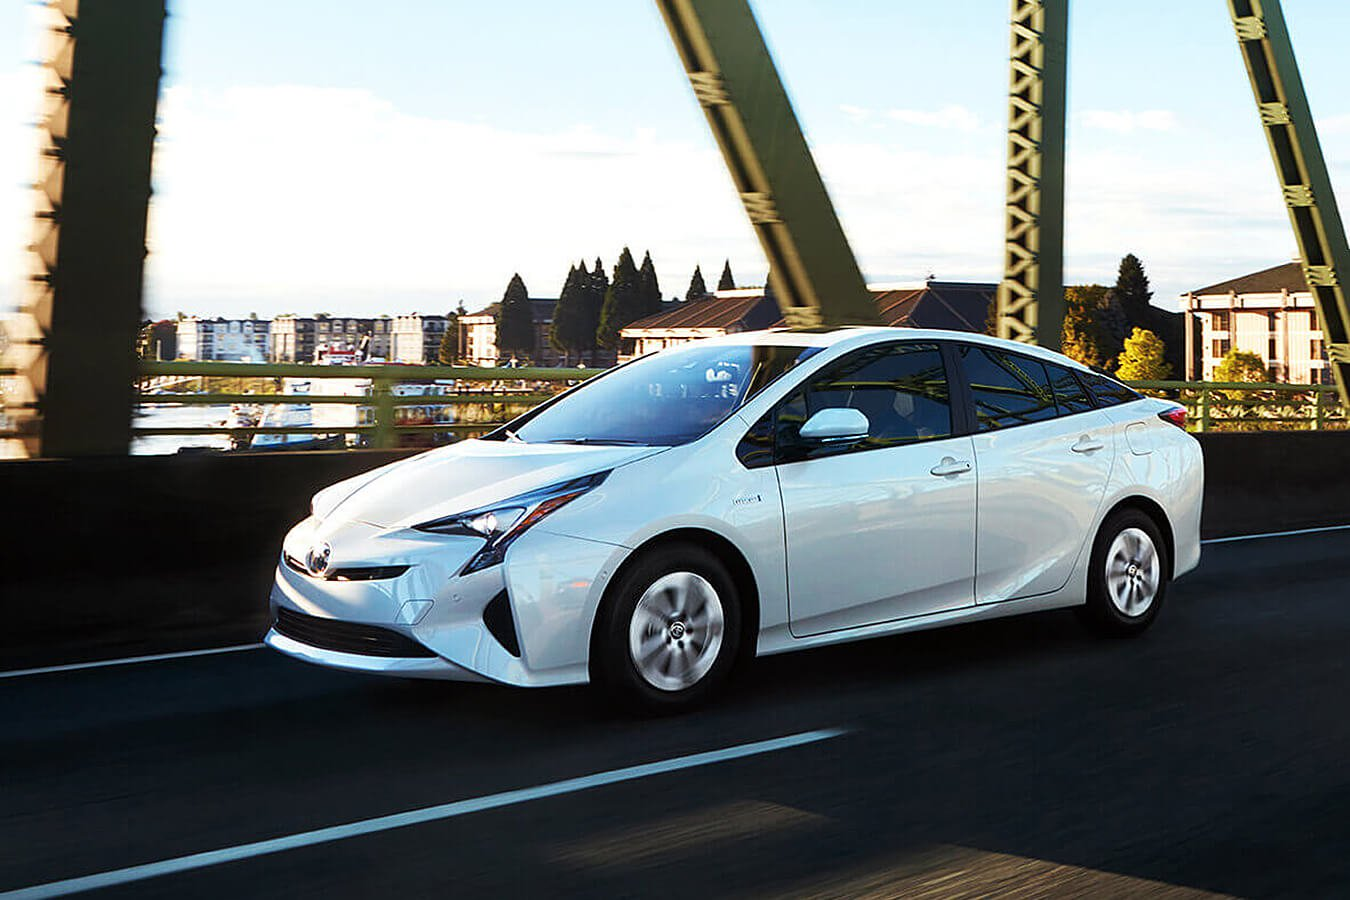 Toyota comienza a decir adiós al diésel en España